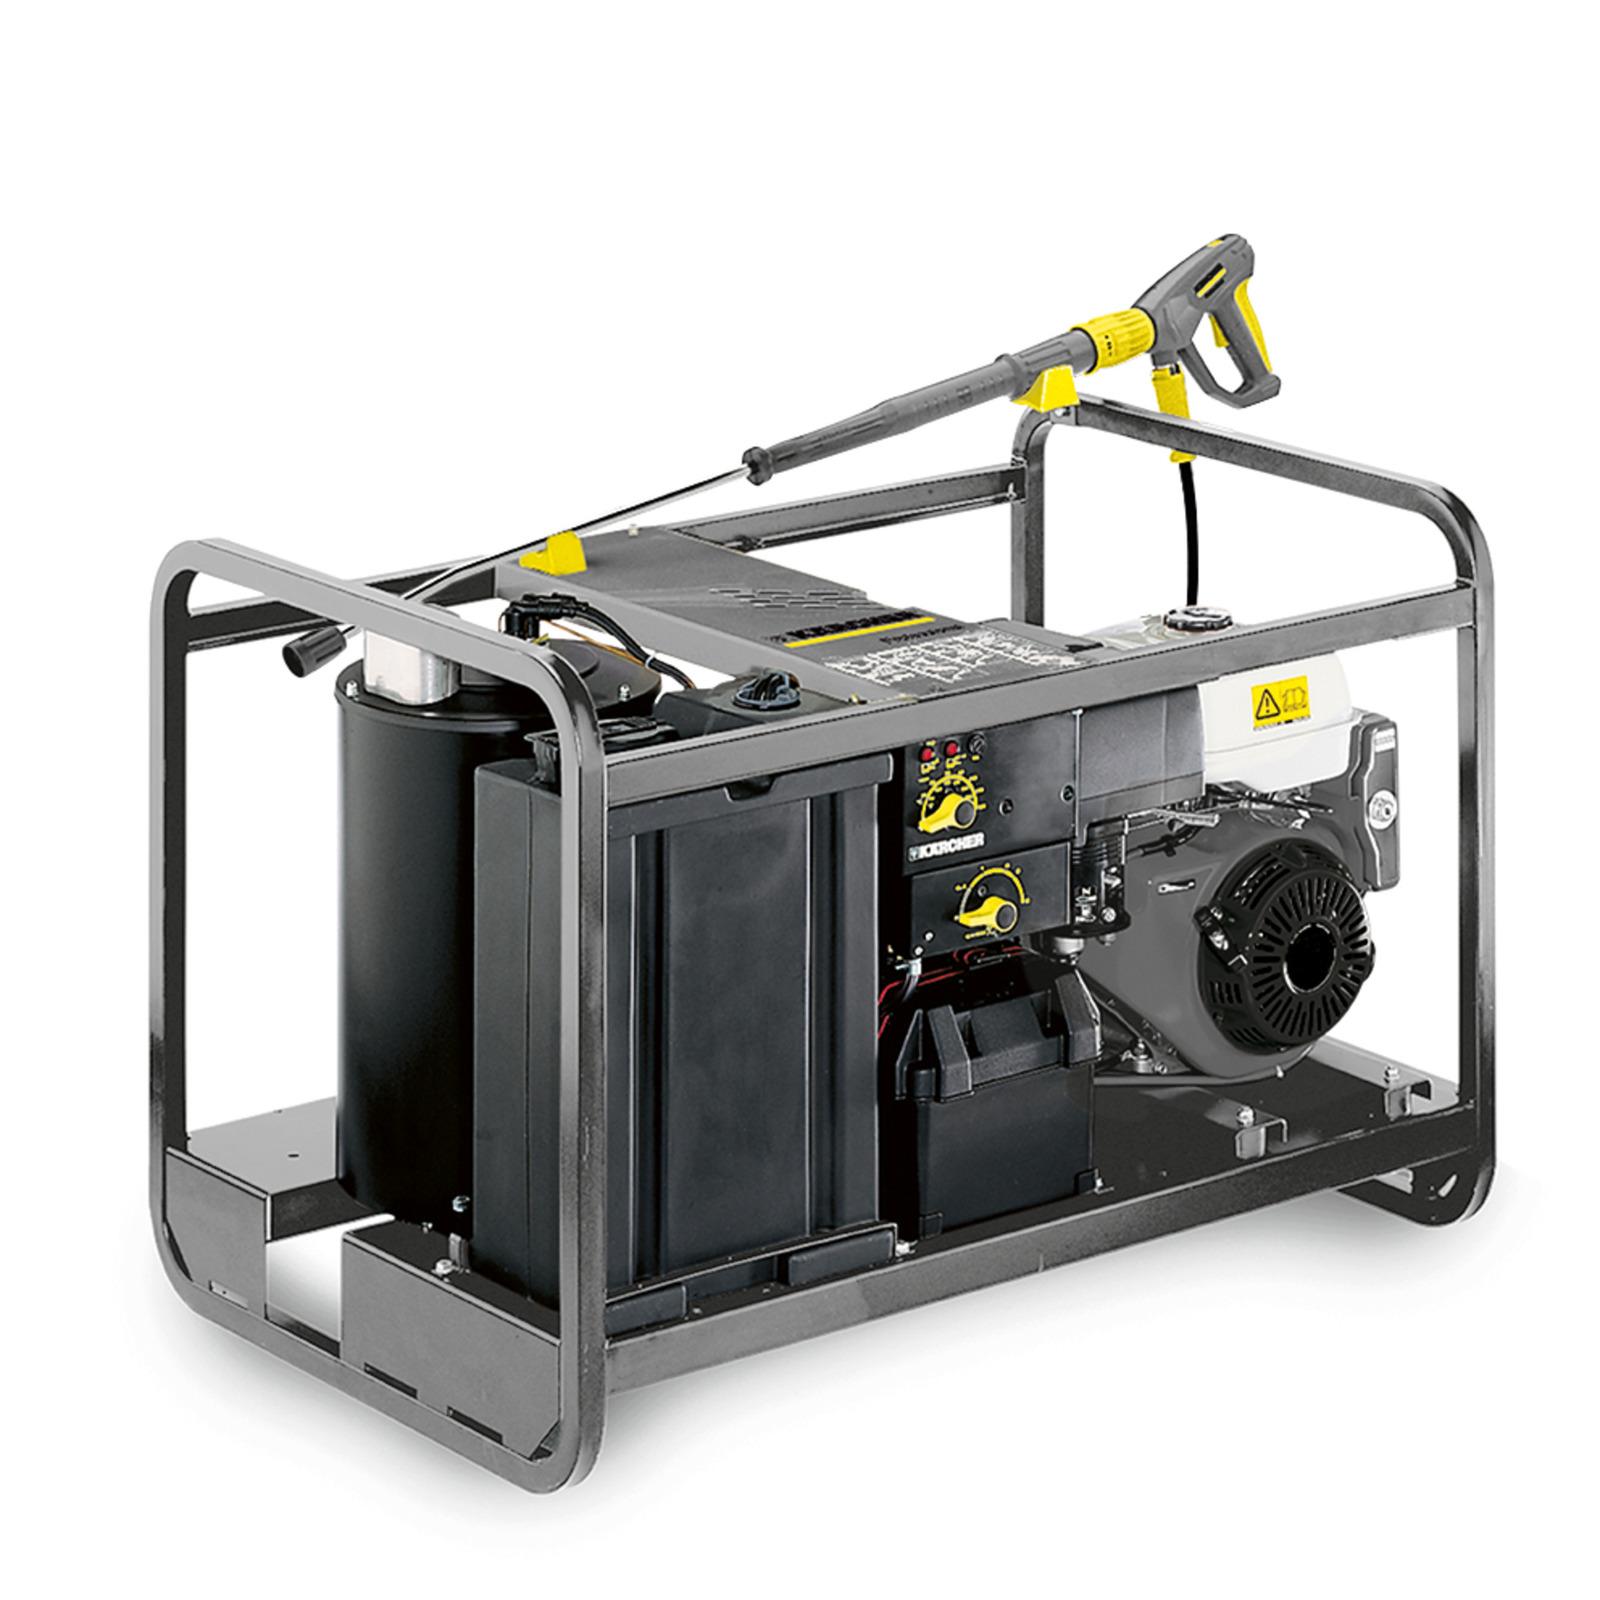 Idropulitrice a Motore Karcher HDS 1000 Be